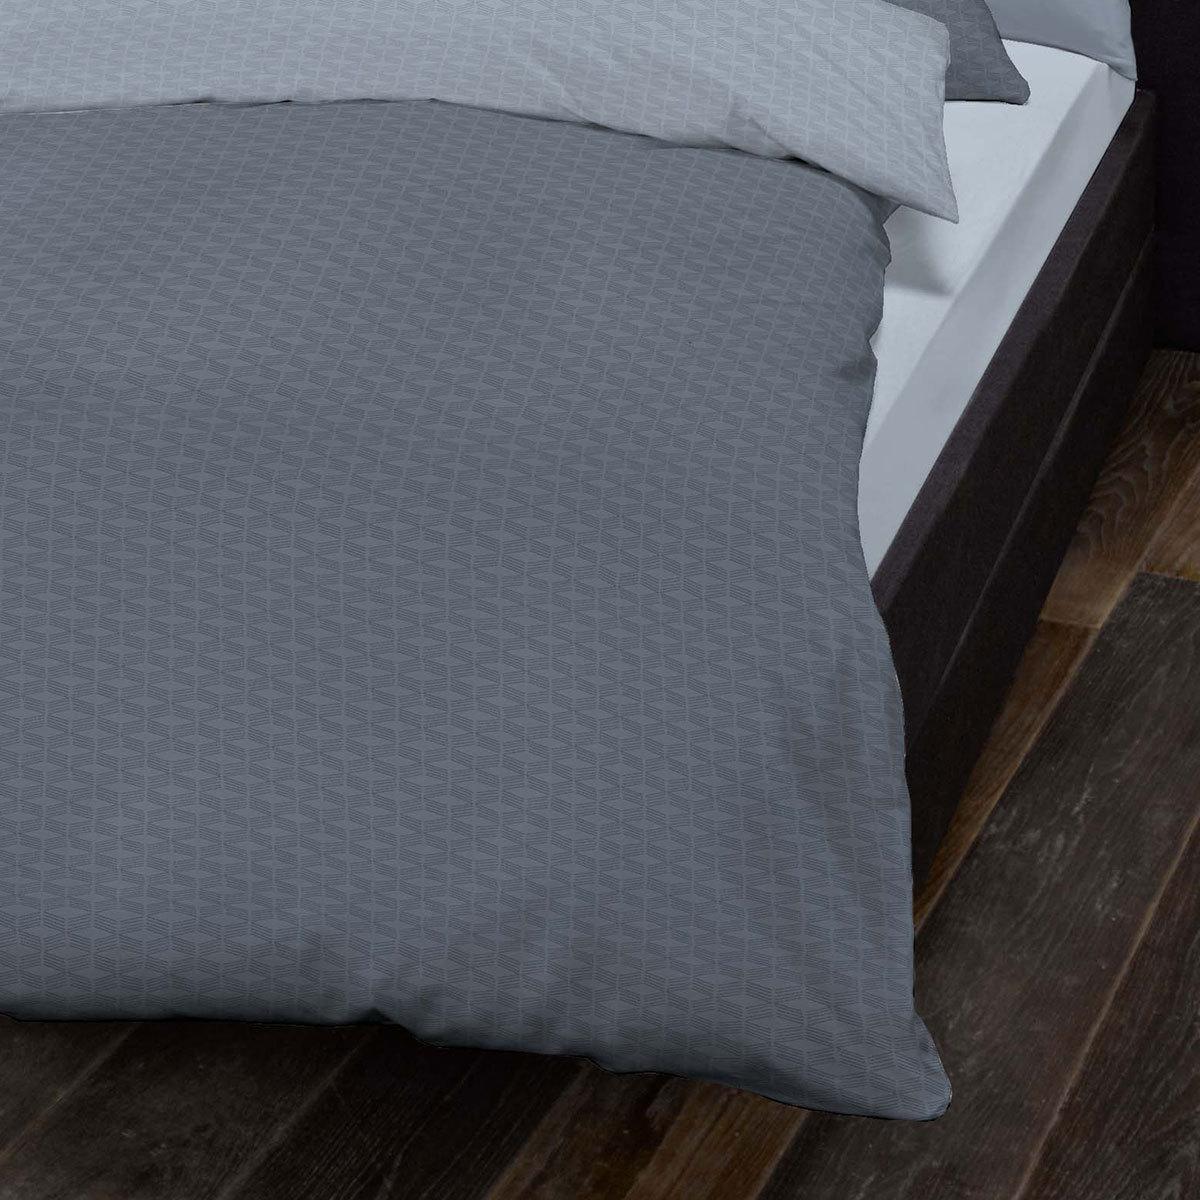 schlafgut mako satin bettw sche negro blau g nstig online. Black Bedroom Furniture Sets. Home Design Ideas